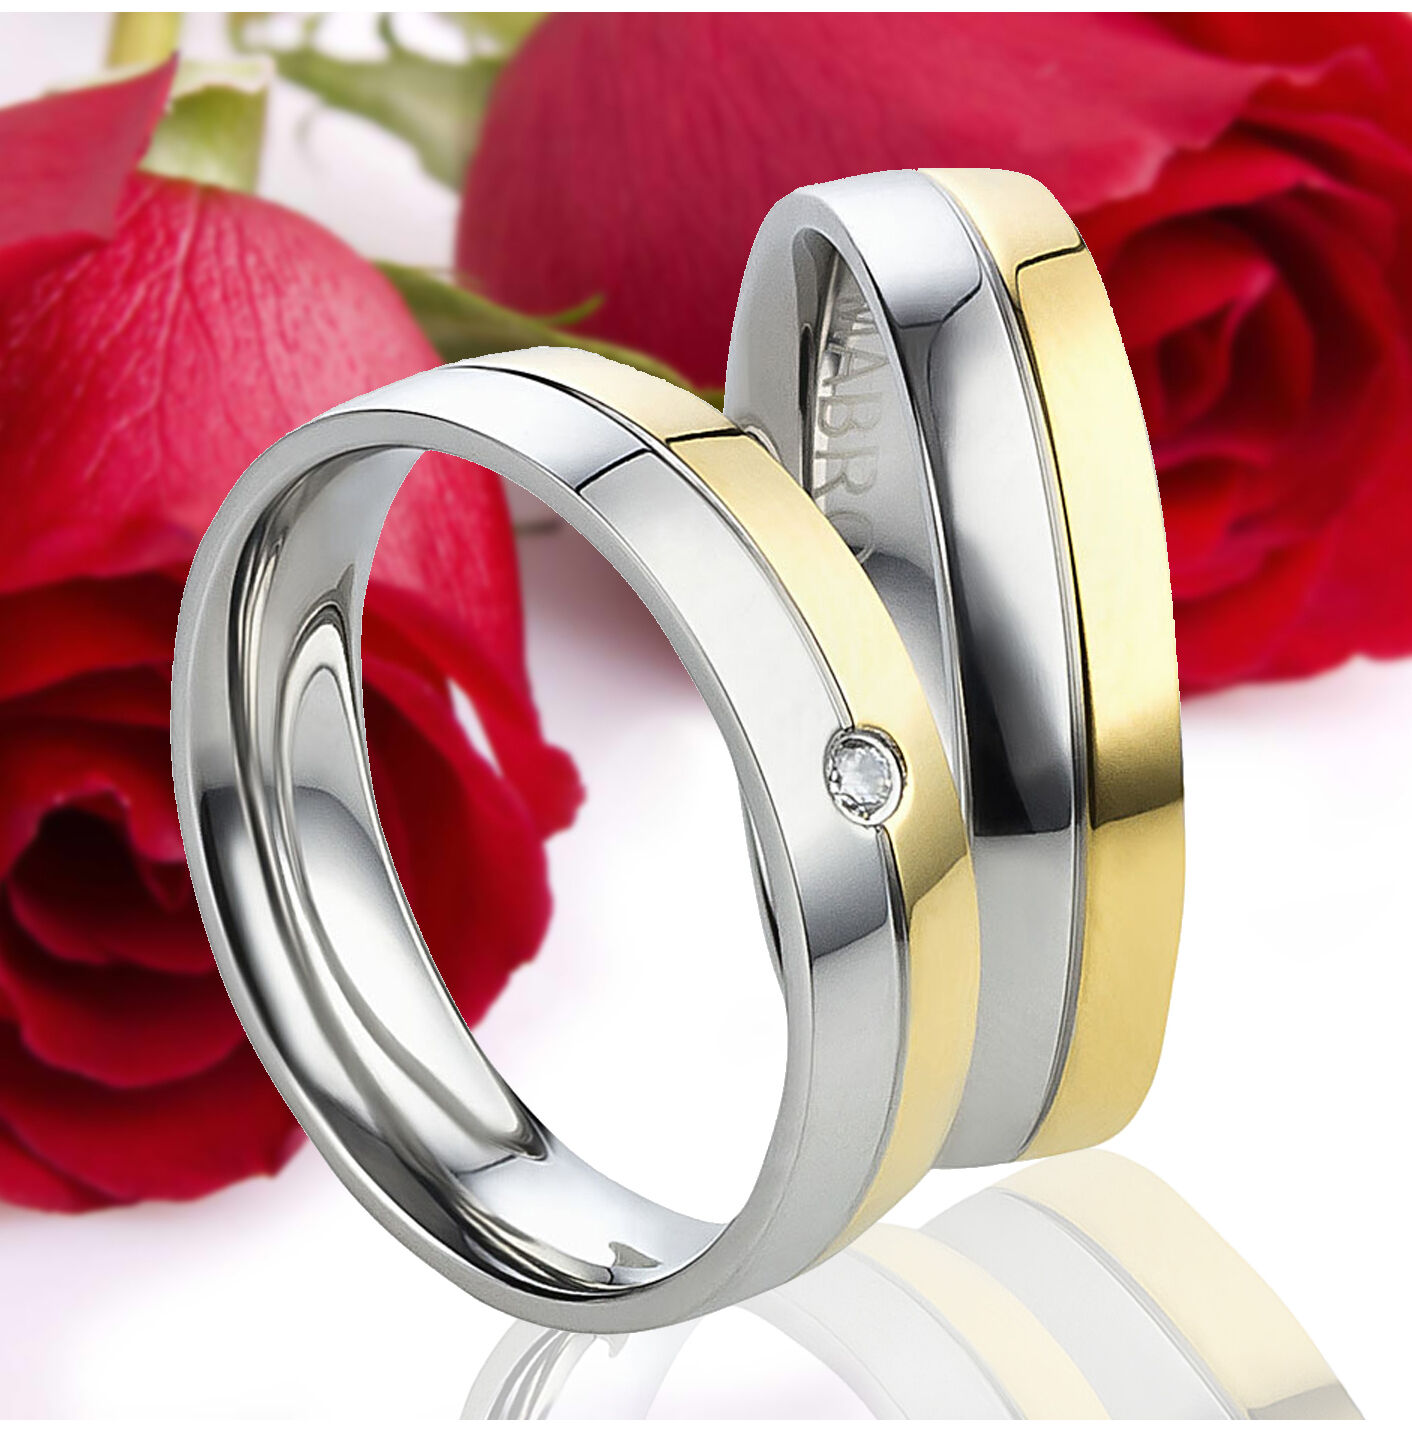 2 fedi nuziali vere di fidanzamento fedi fedi fedi oro placcati INCISIONE GRATIS te3116 6c7b53